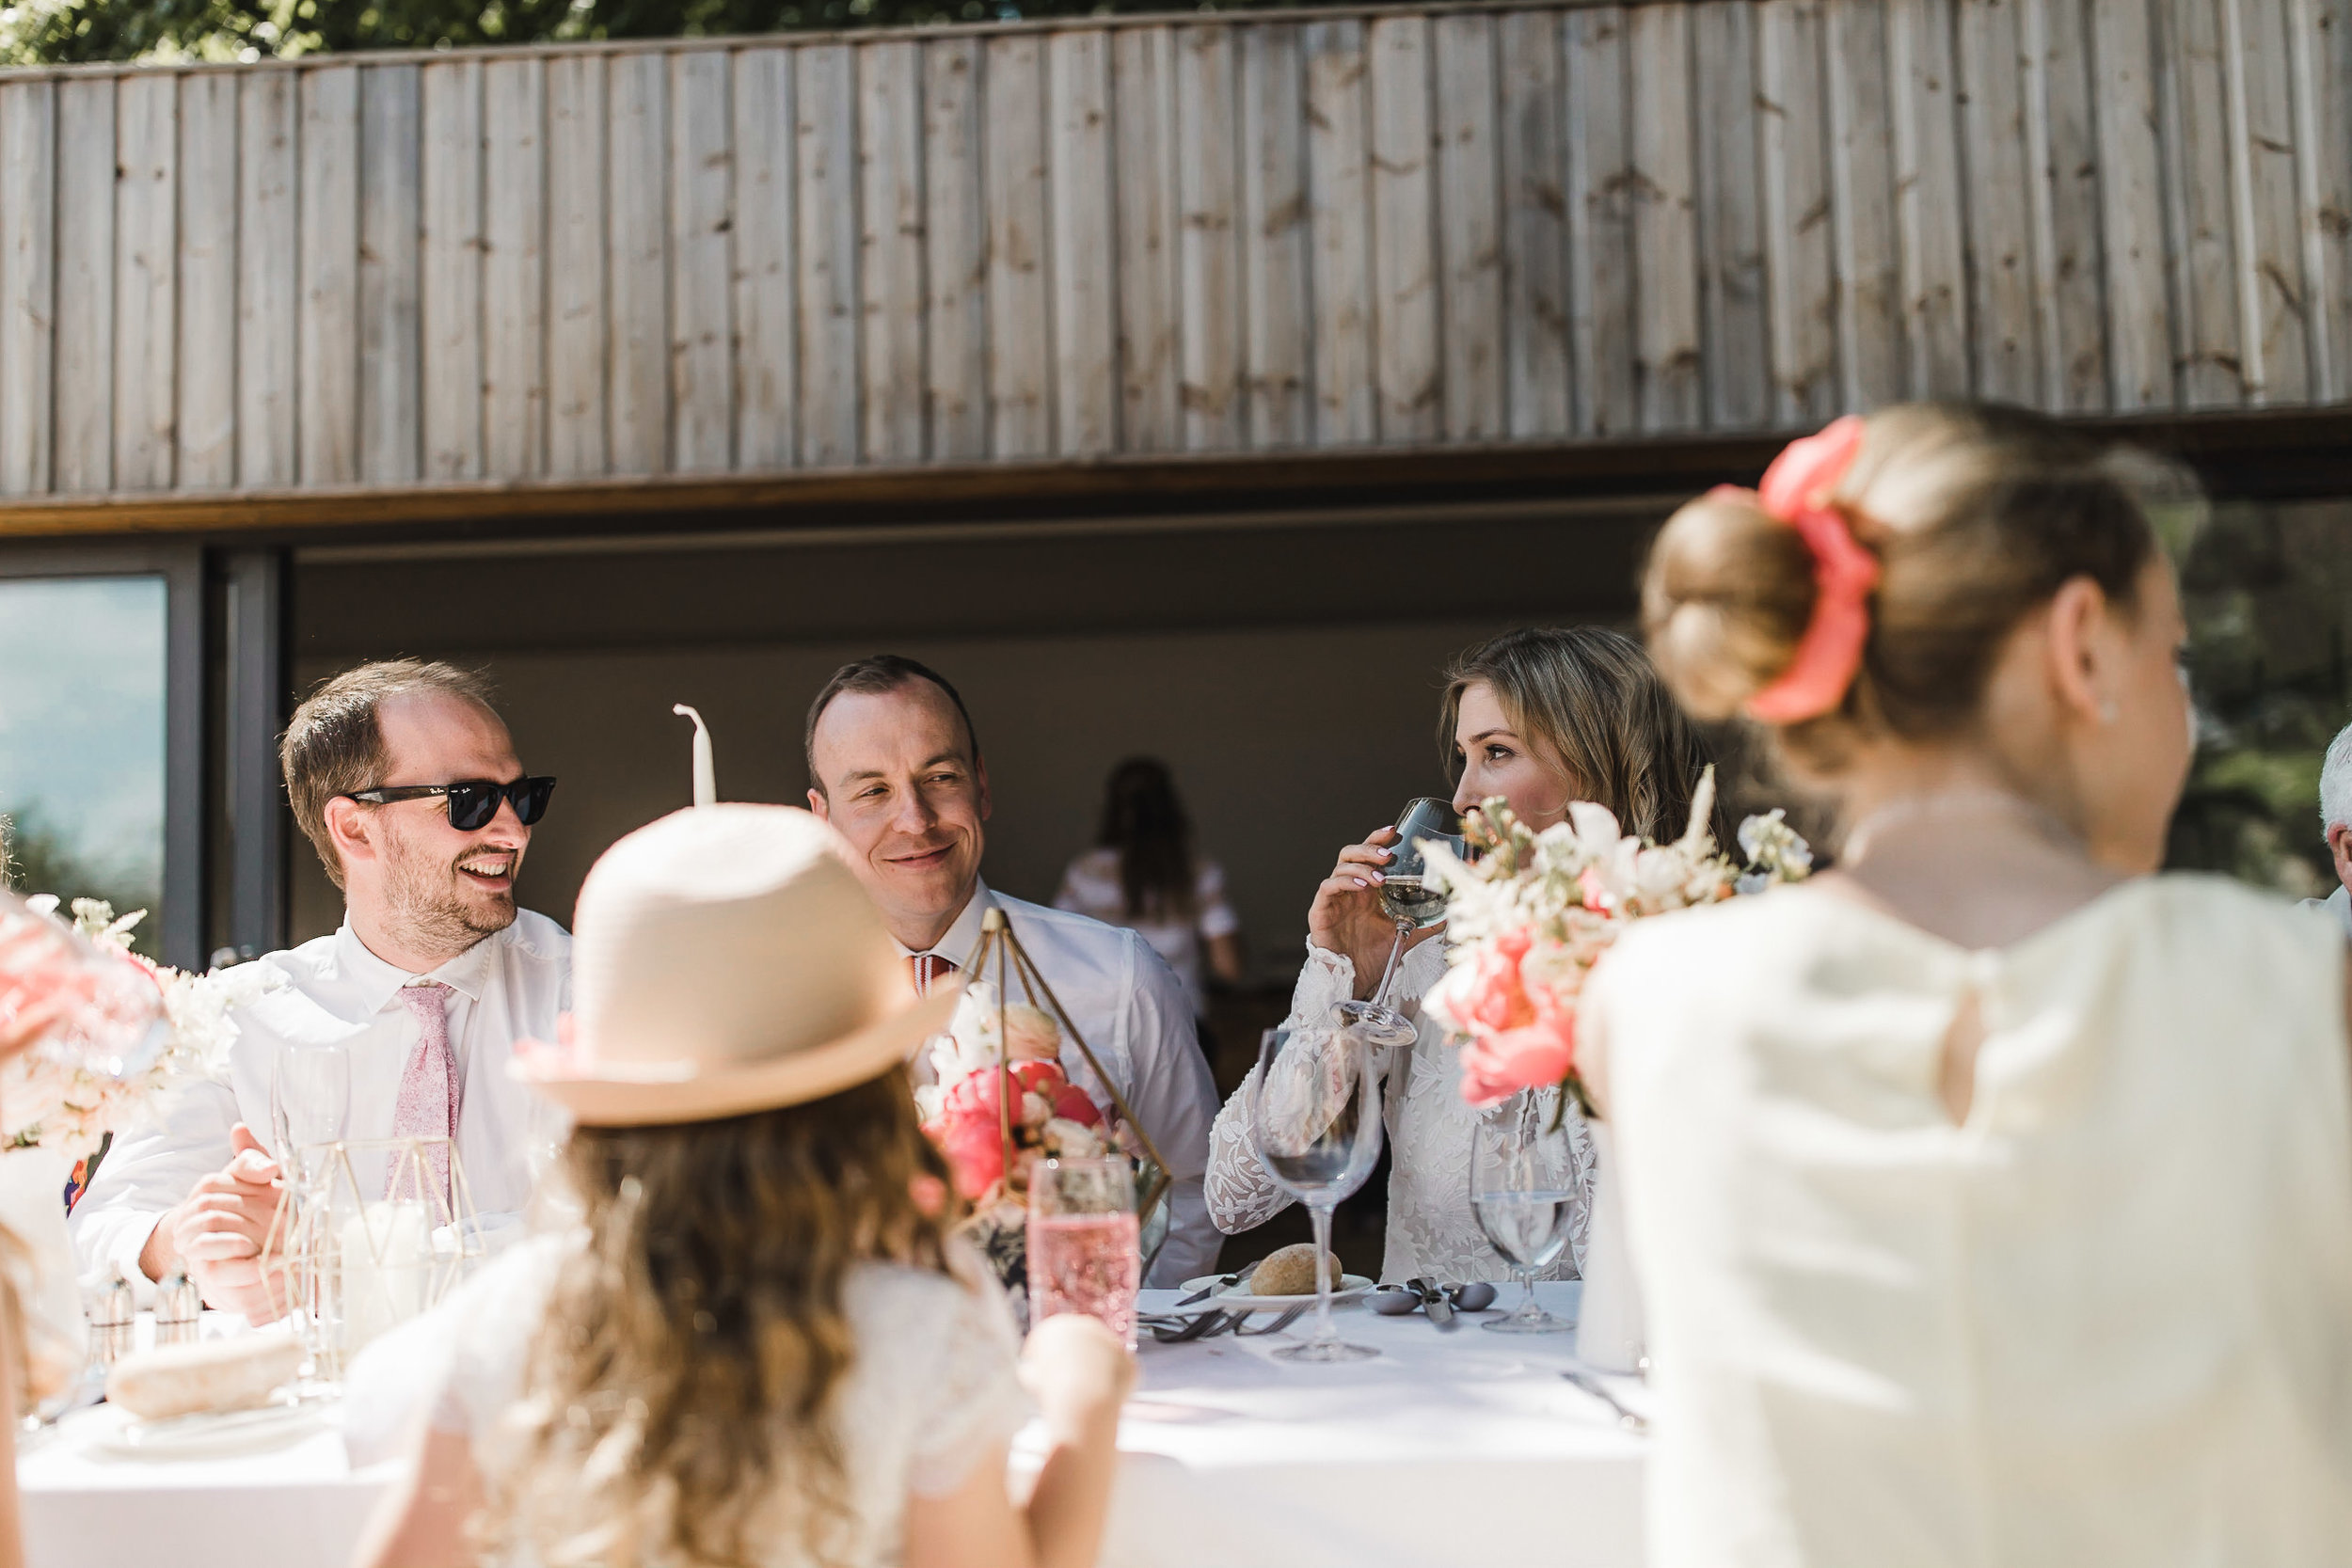 Roundhay-Leeds-Backyard-Wedding-Becs-Chris-137.jpg